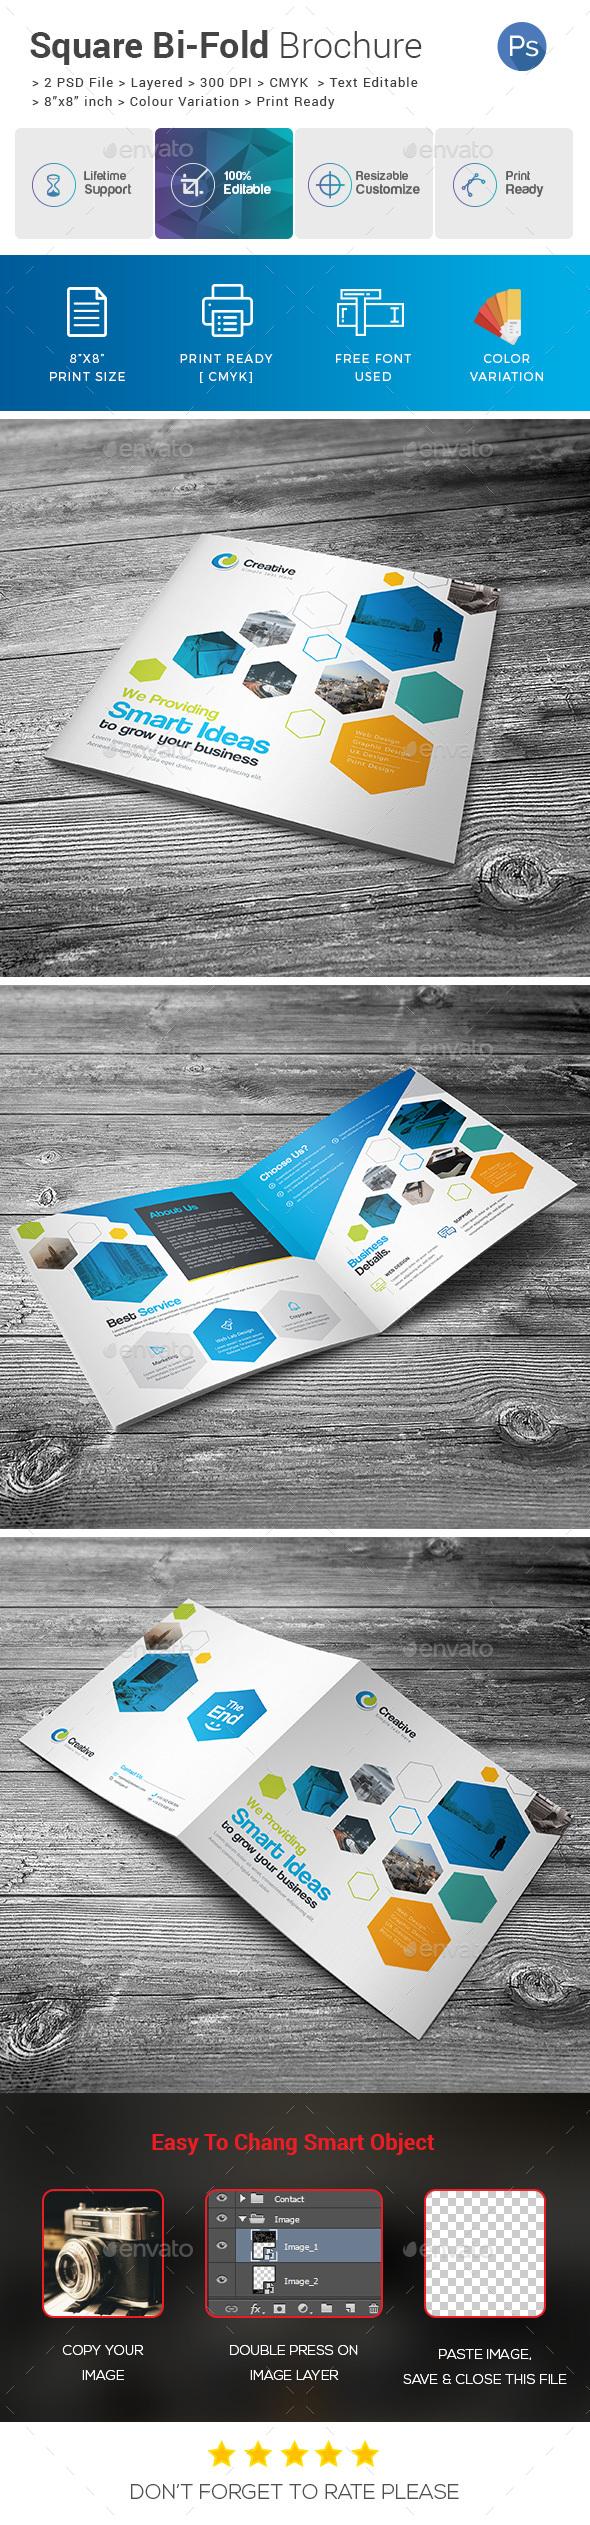 Square Bi-Fold Template - Corporate Brochures